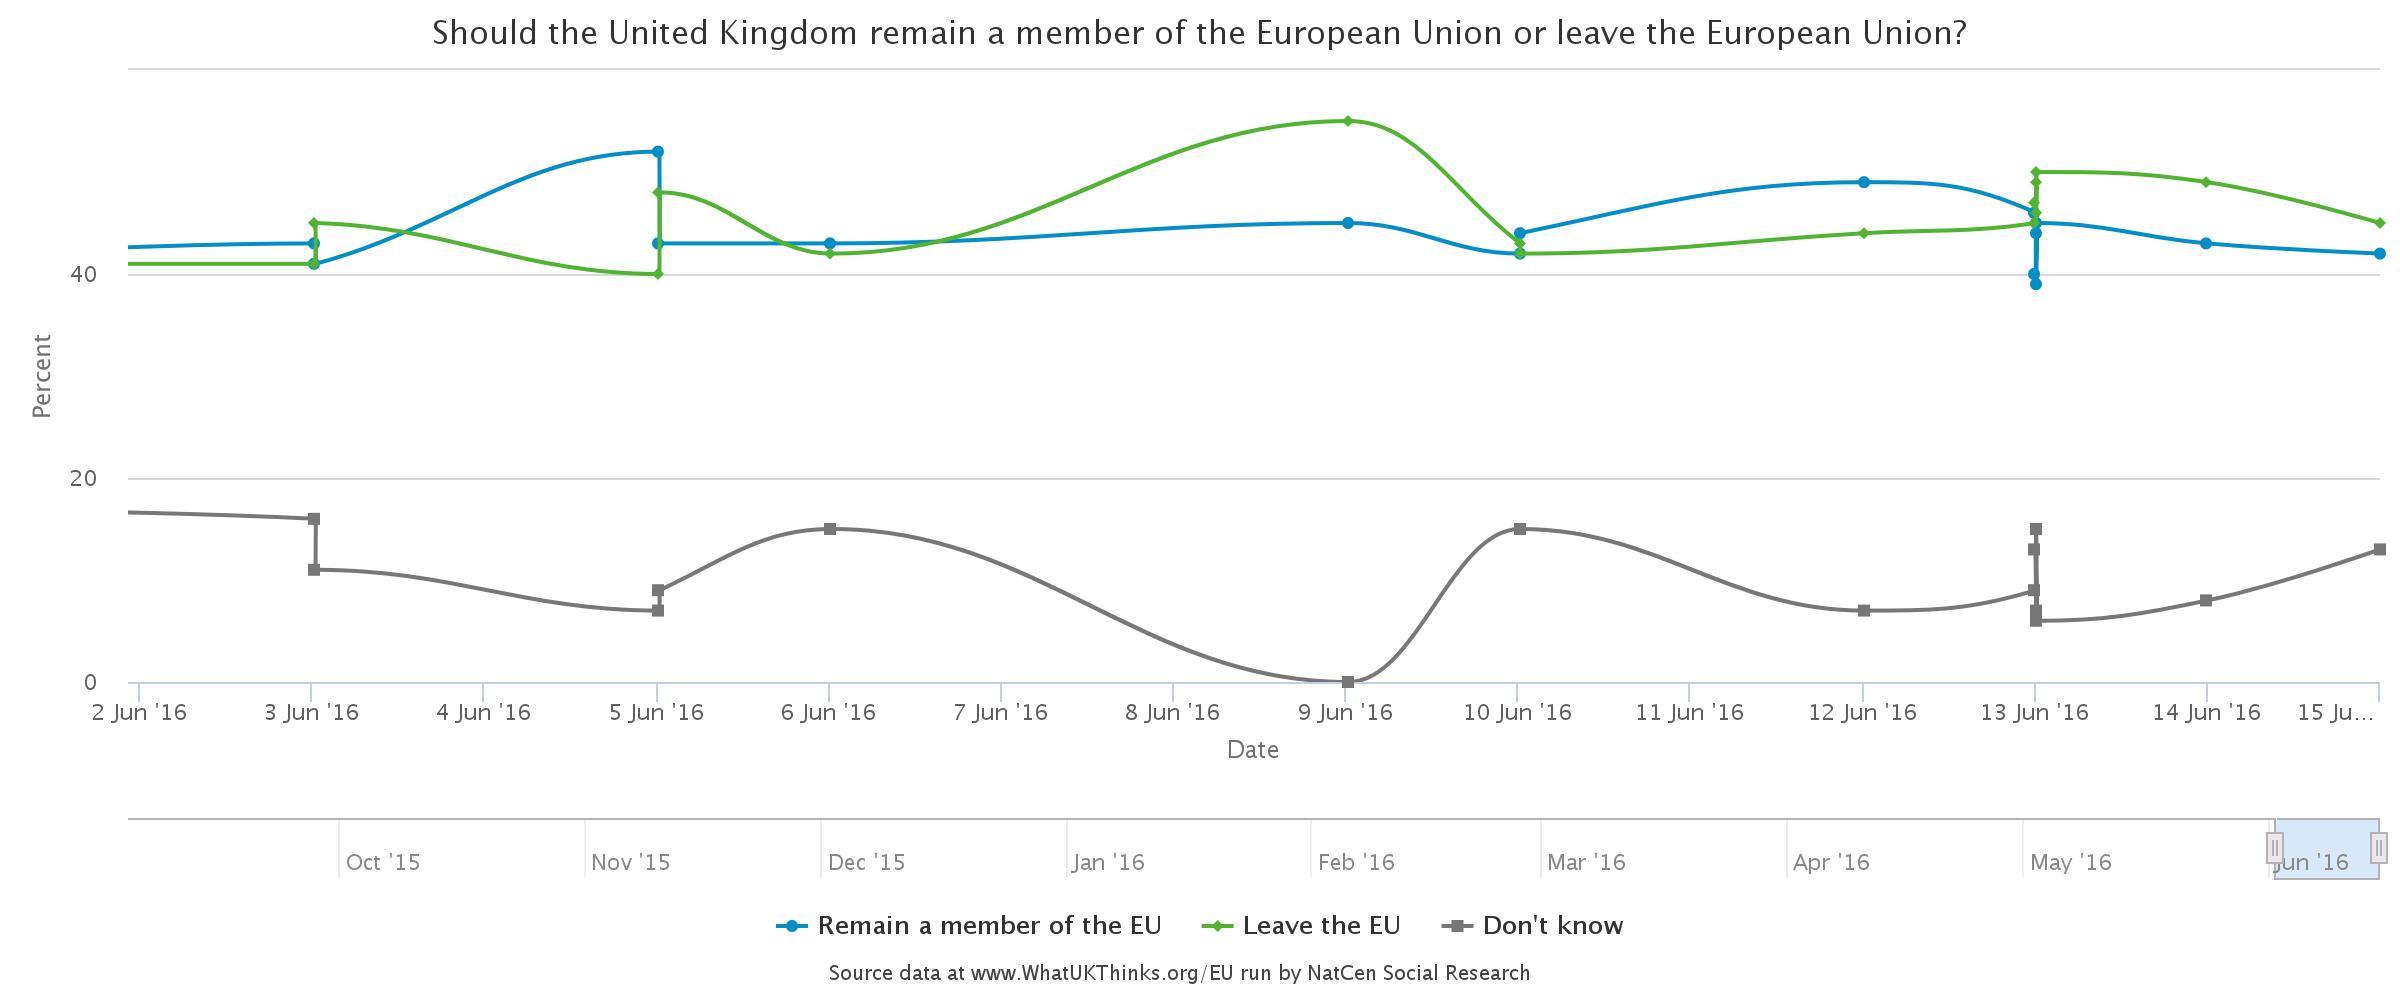 brexit referendum implications for spanish real estate market